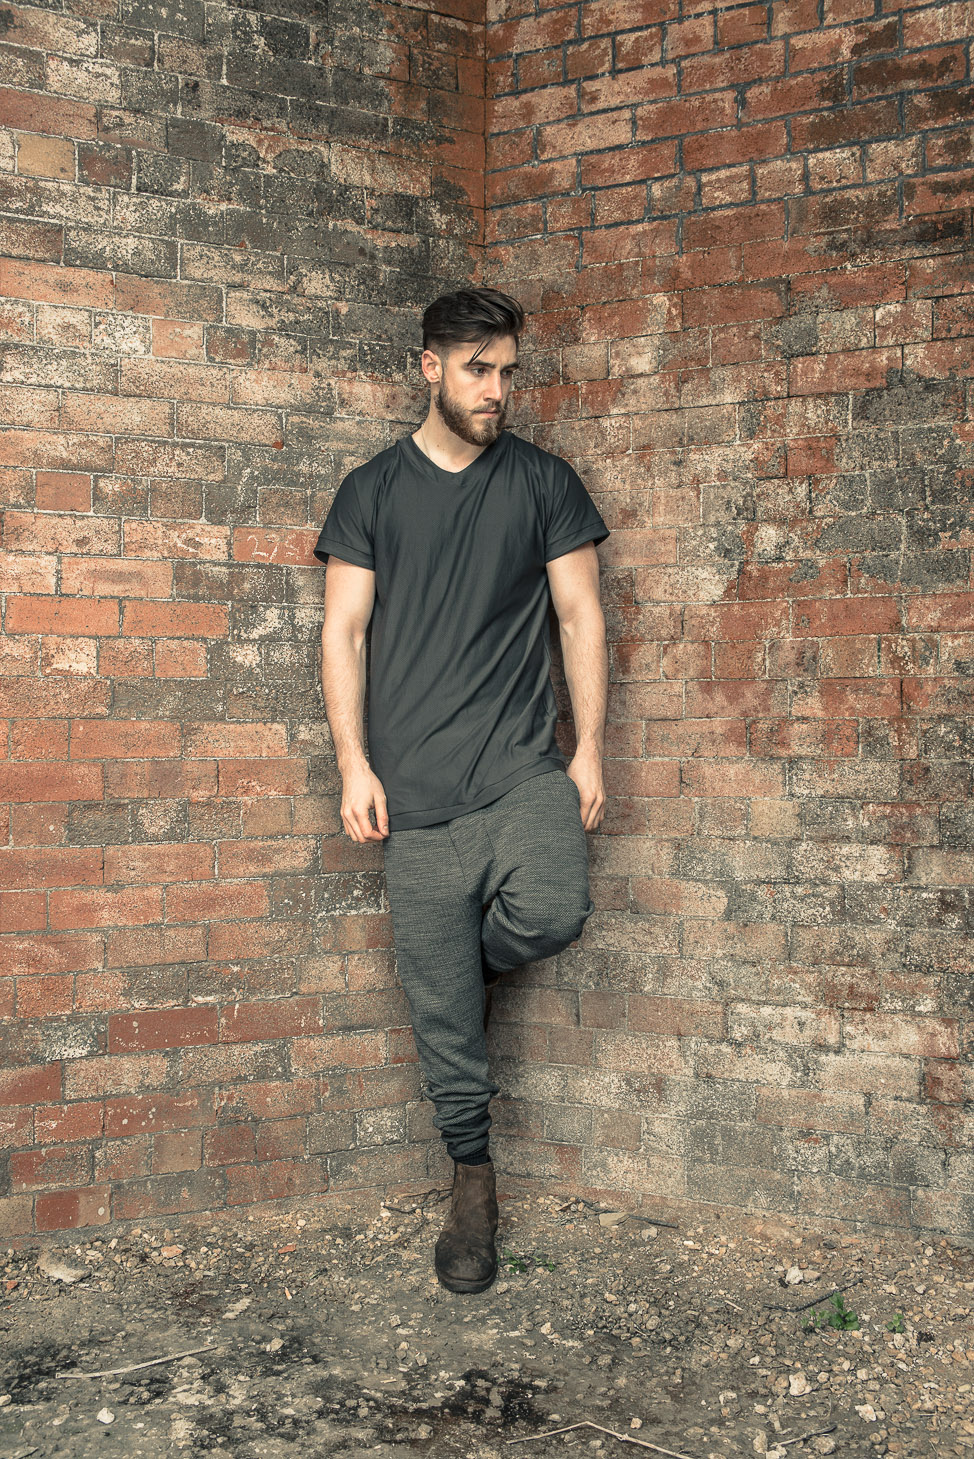 zaramia-ava-zaramiaava-leeds-fashion-designer-ethical-sustainable-tailored-minimalist-mesh-oversized-taichi-raglan-versatile-drape-grey-tshirt-top-hareem-trousers-black-grey-texture-styling-1